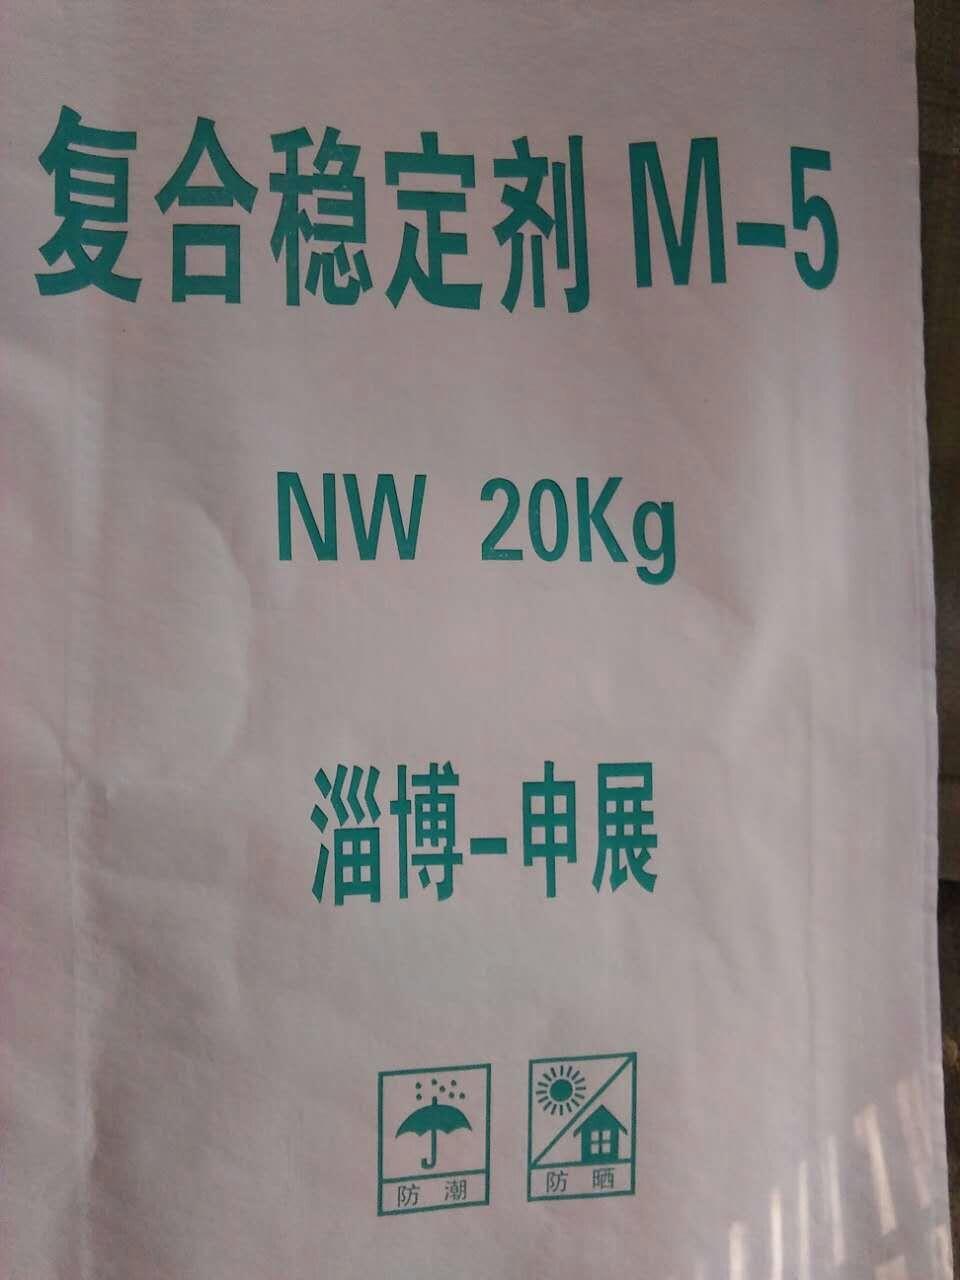 M-5稳定剂 抗分解剂 甲基磺草酮油悬专用助剂示例图1